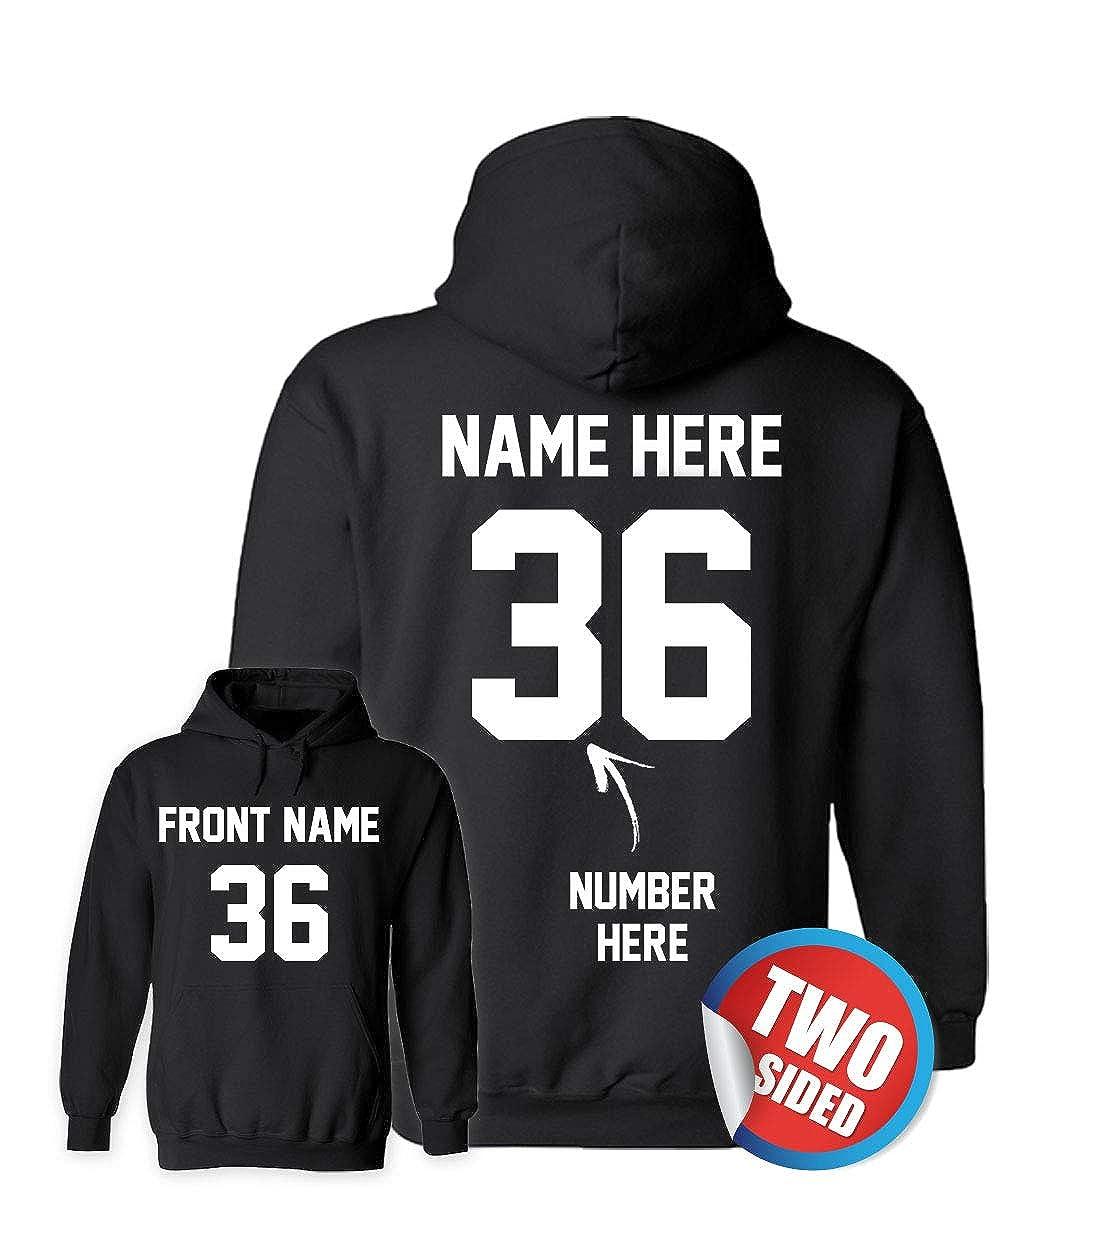 Custom 2 Sided Tshirts - Front & Back - Design...